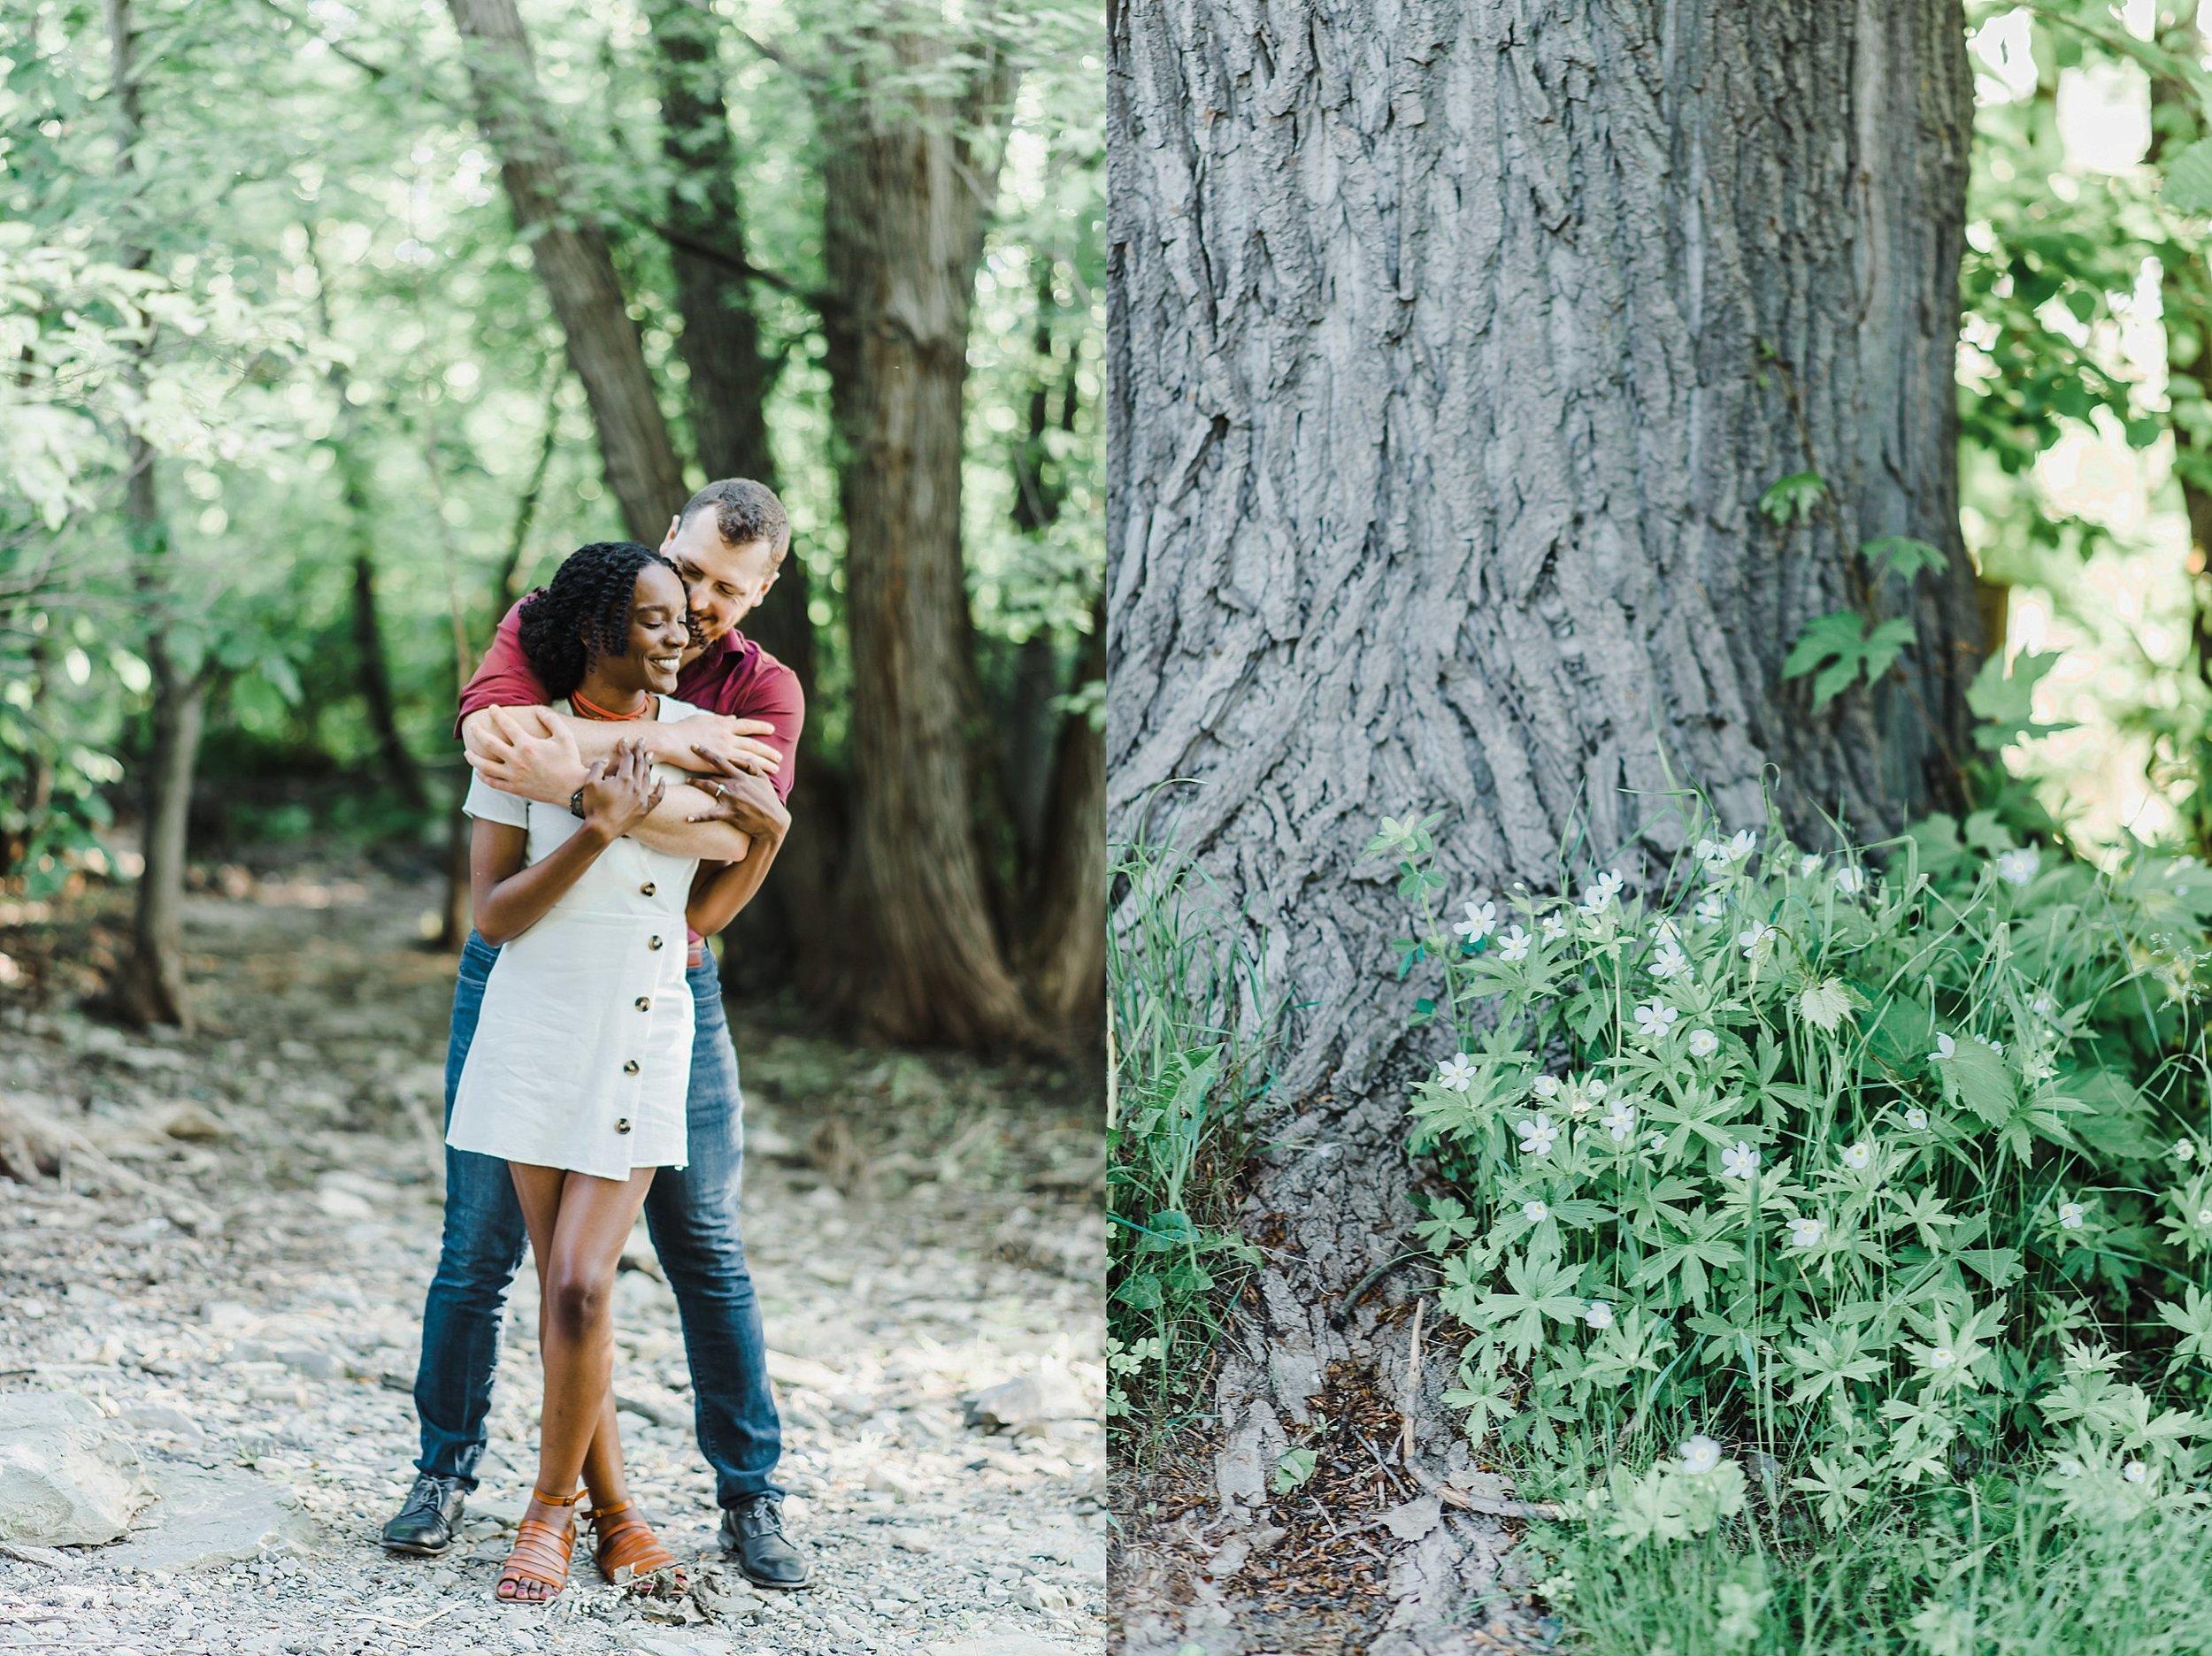 light airy indie fine art ottawa wedding photographer | Ali and Batoul Photography_0157.jpg